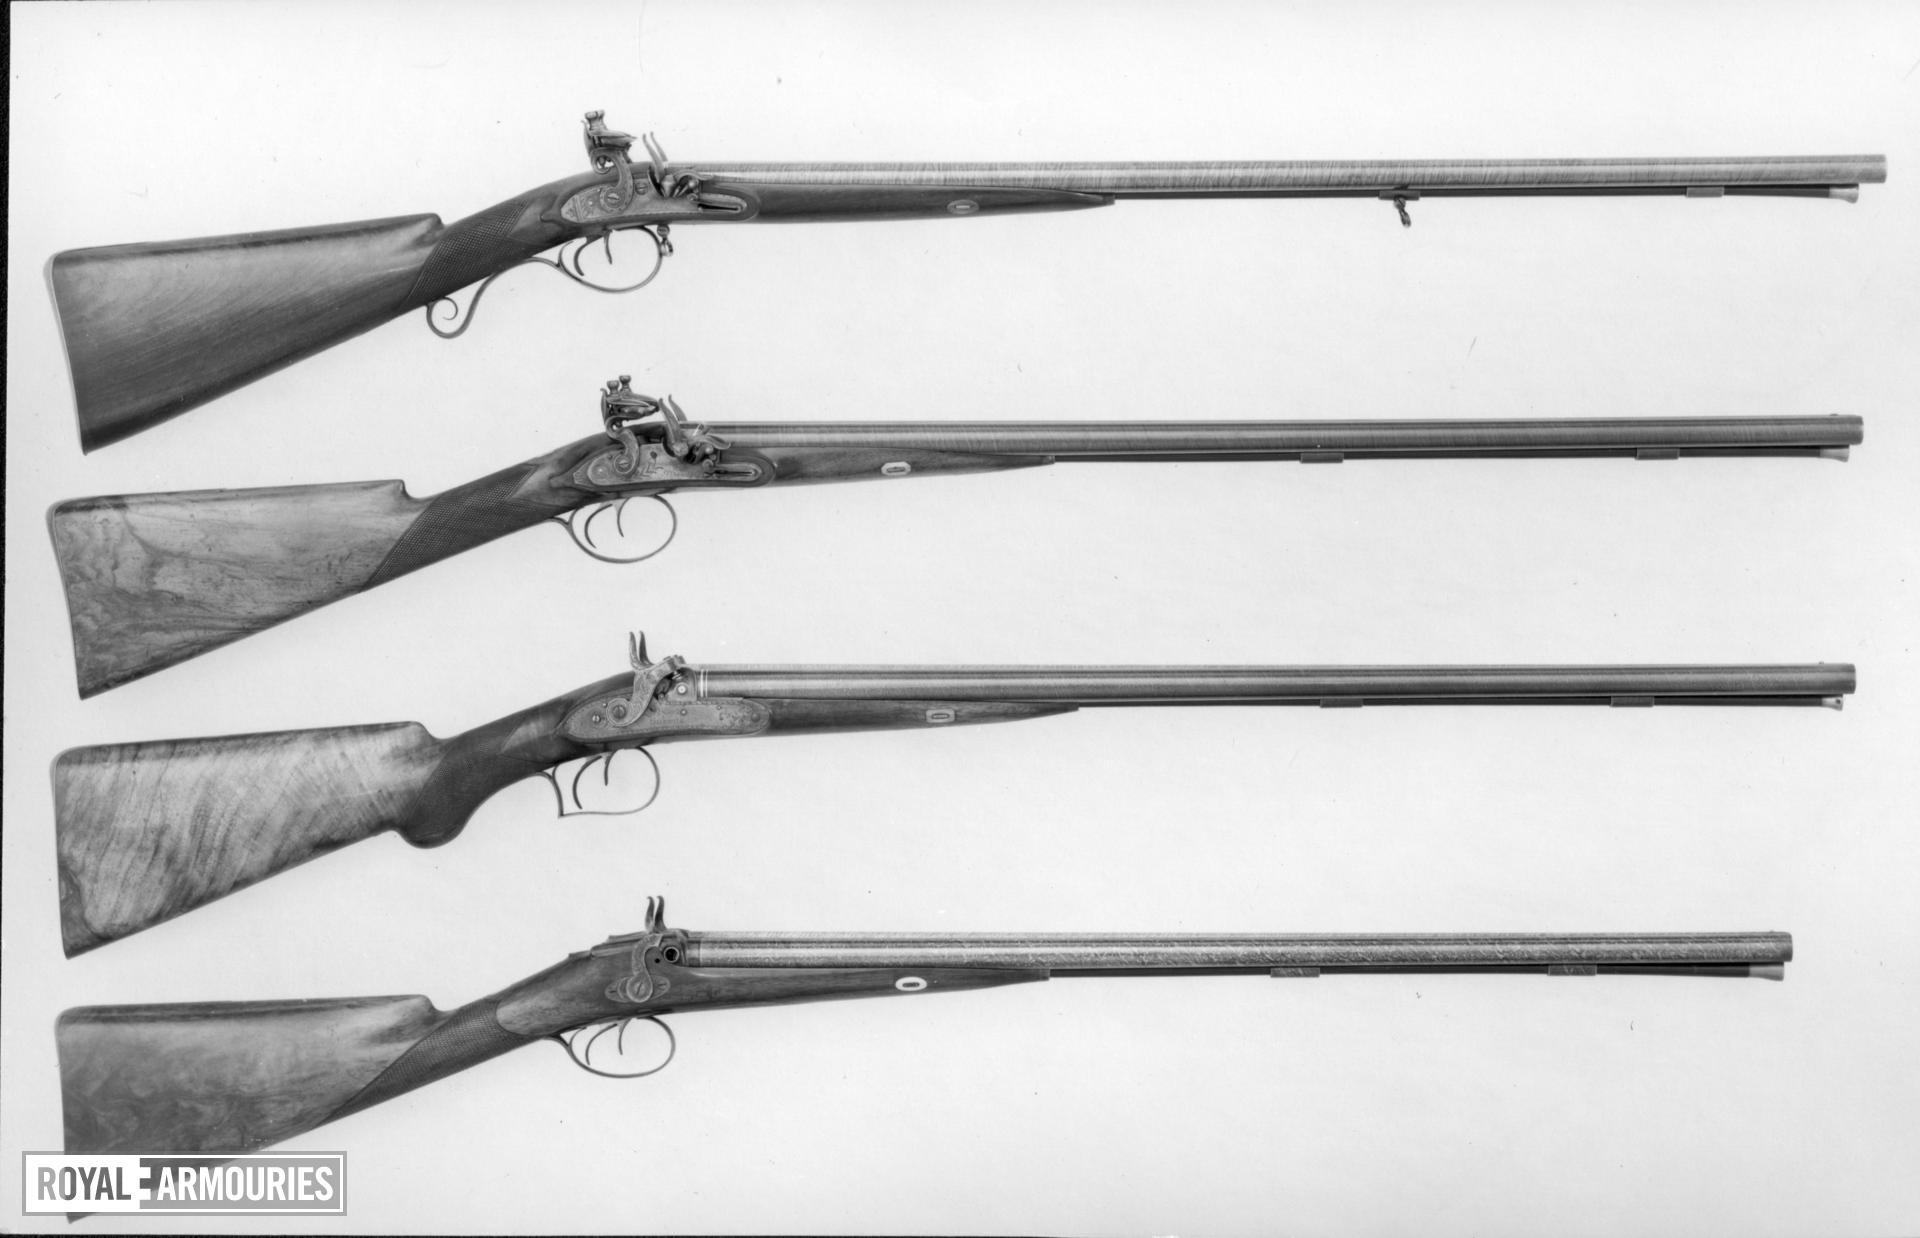 Flintlock double-barrelled shotgun - By Ezekiel Baker For Frederick Augustus, Duke of York and Albany, second son of George III, 1763-1827